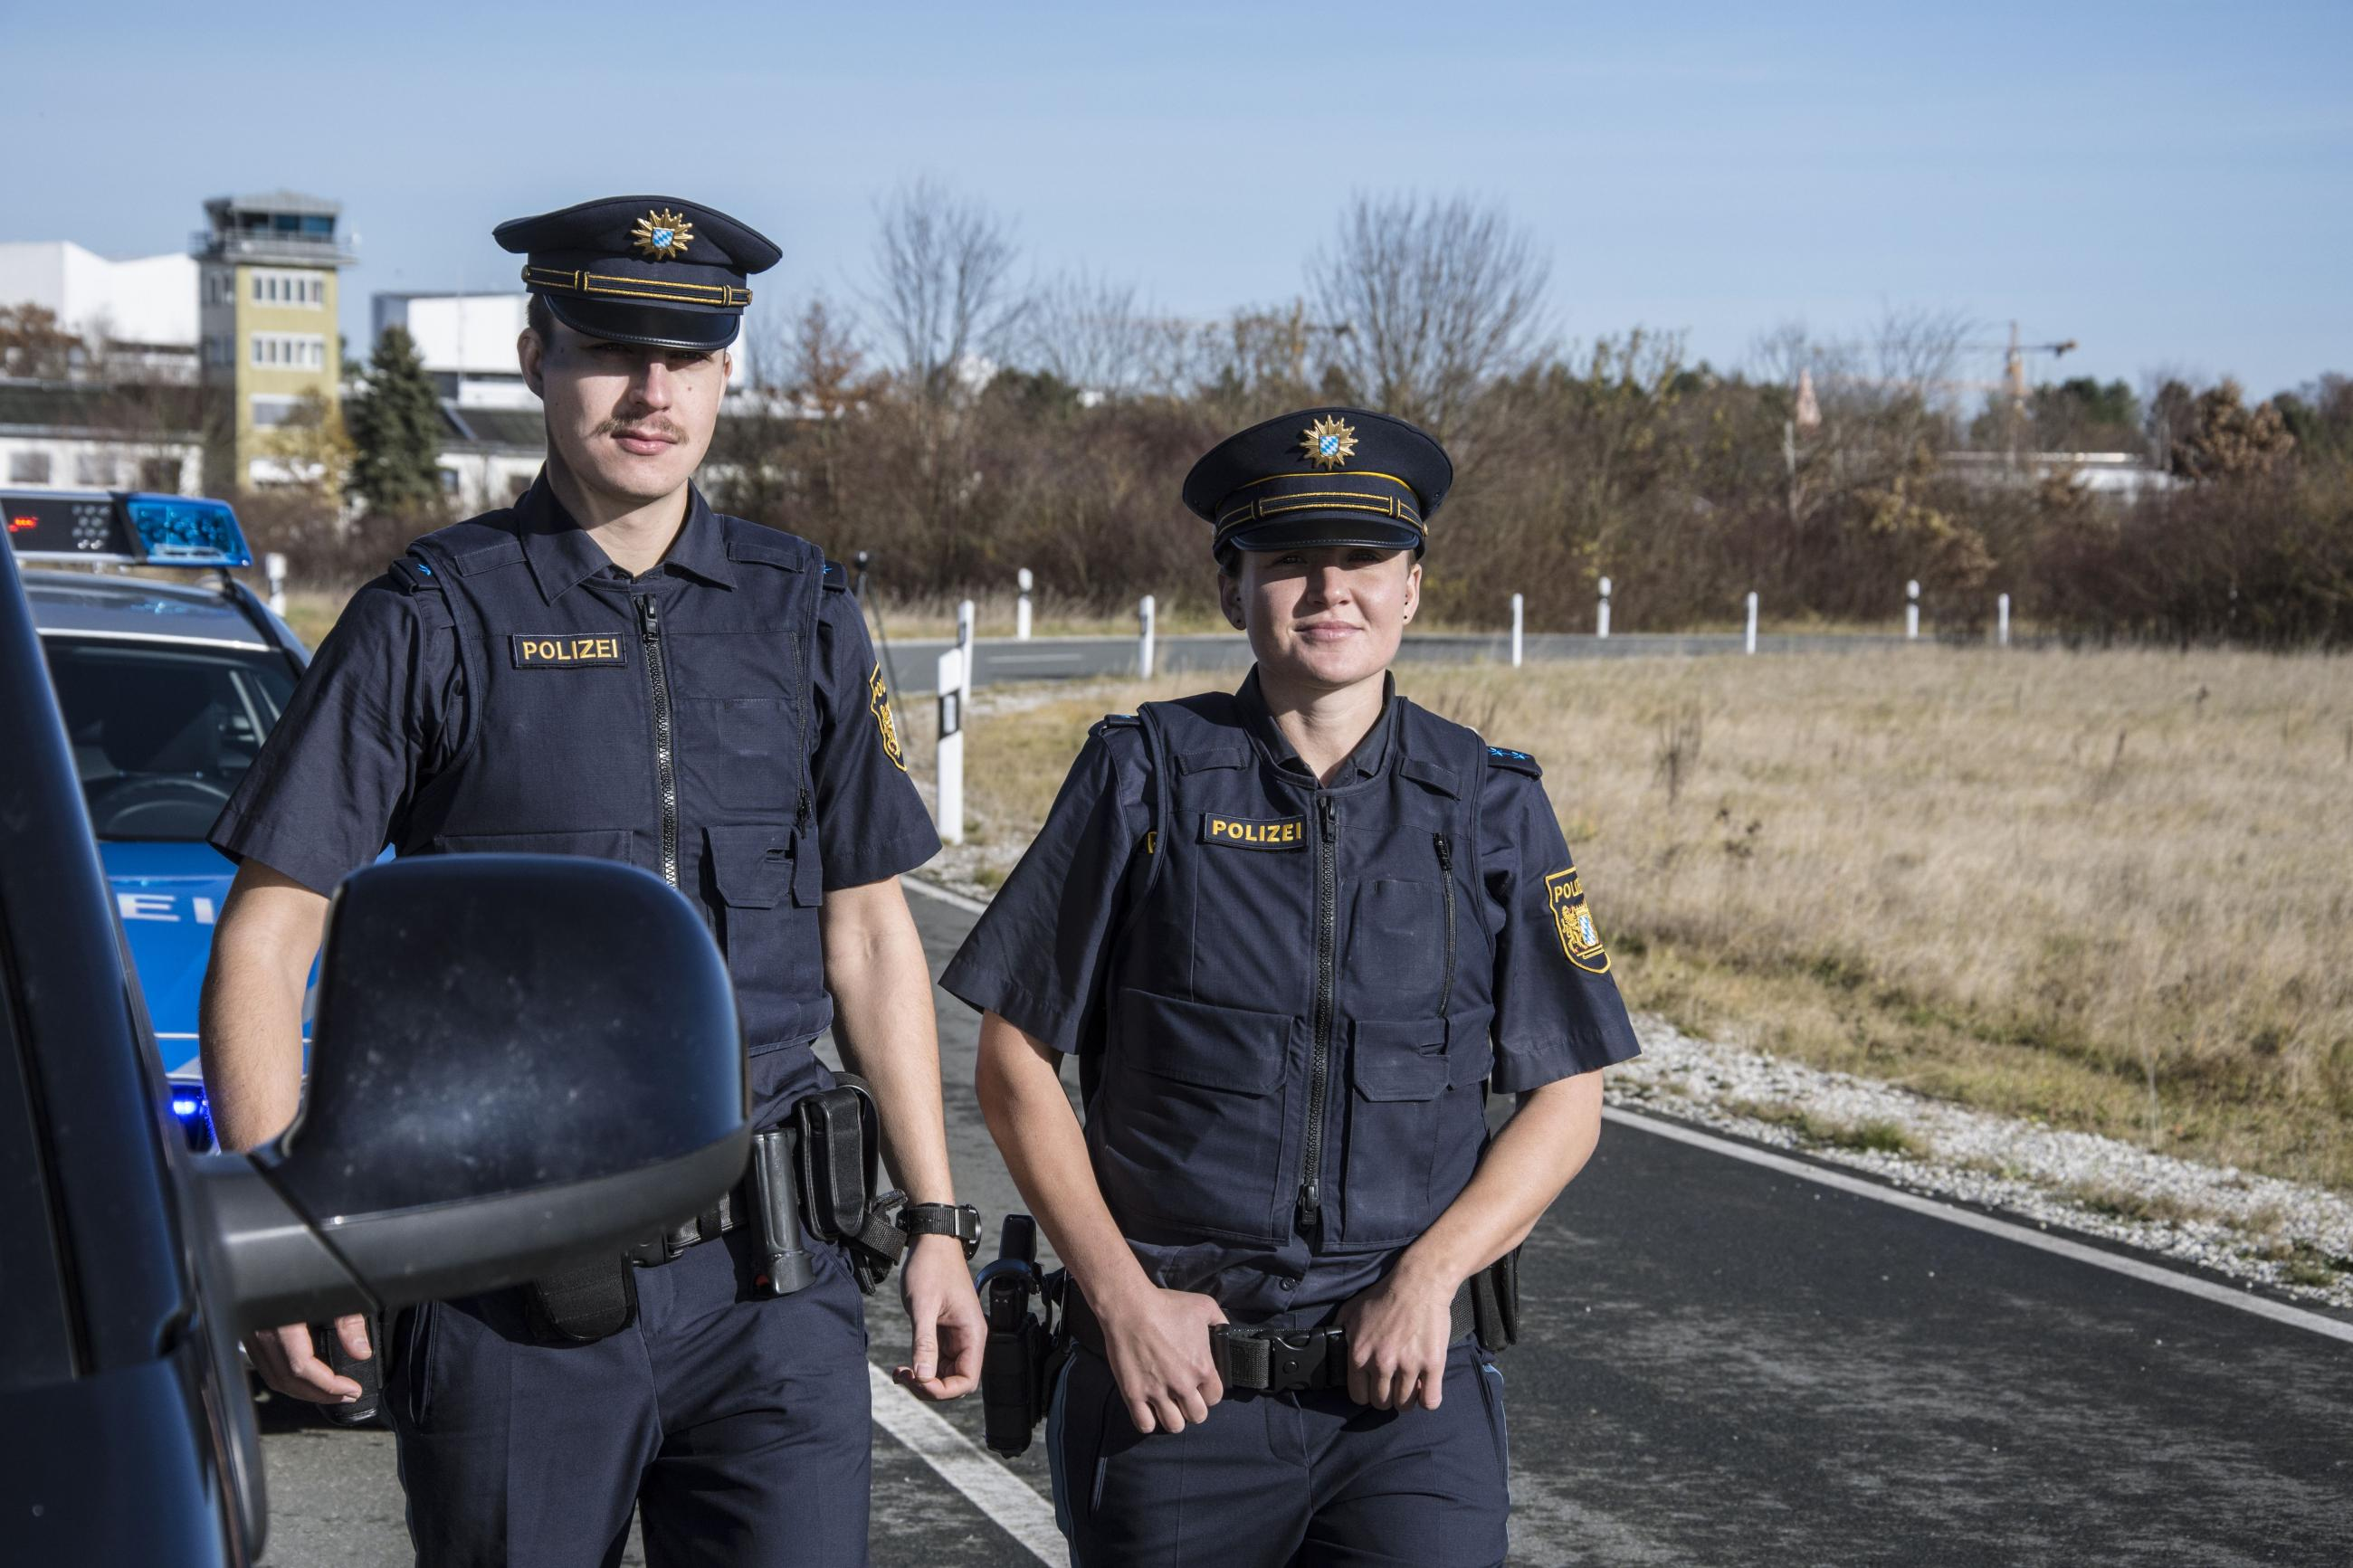 Polizei Cuxhaven Aktuell